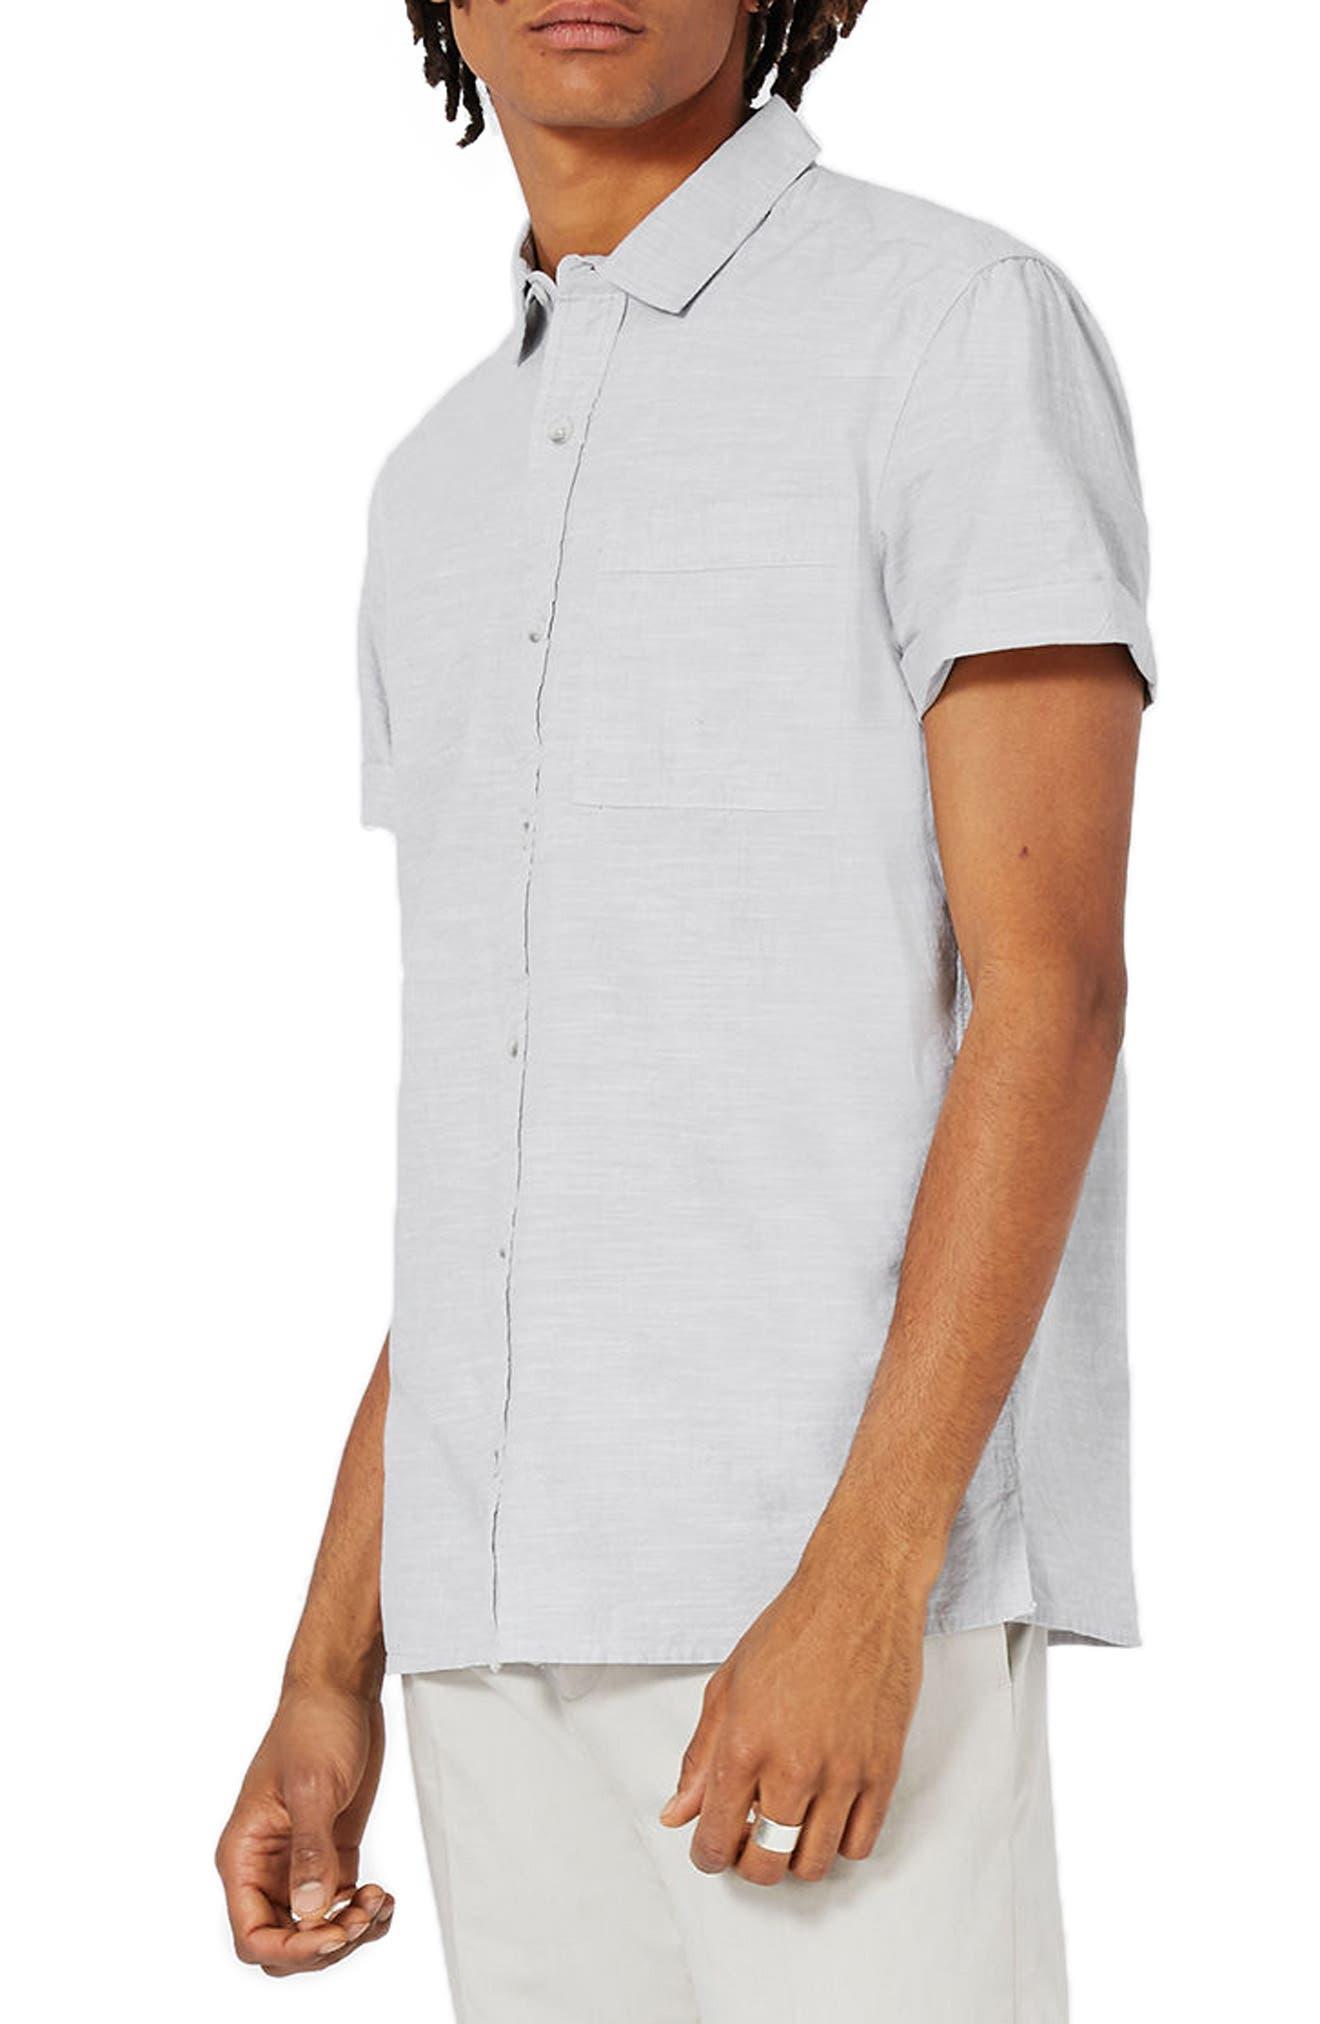 Topman Slub Cotton Shirt